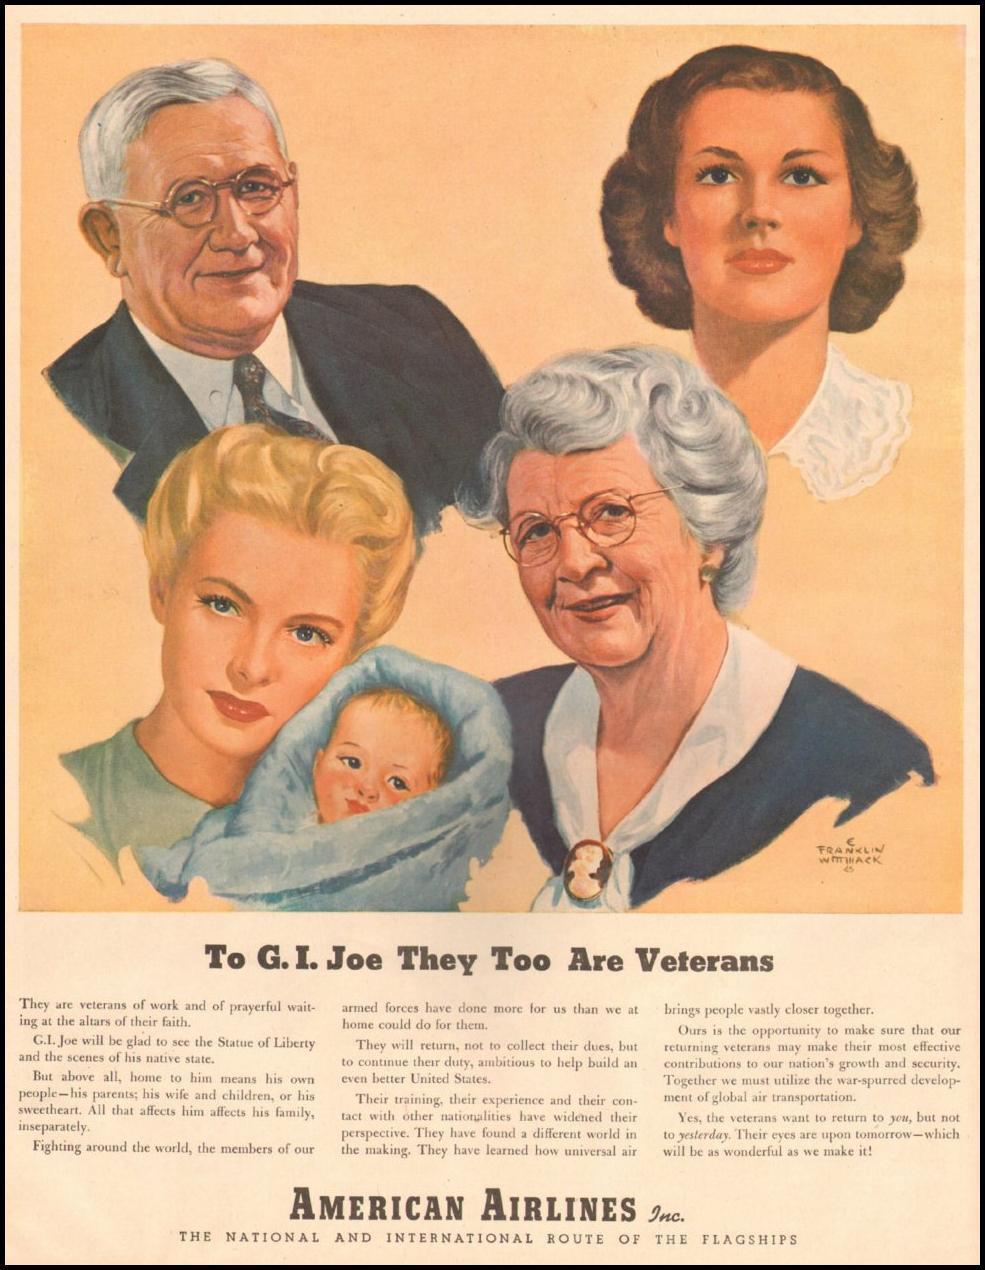 AIR TRAVEL LIFE 03/12/1945